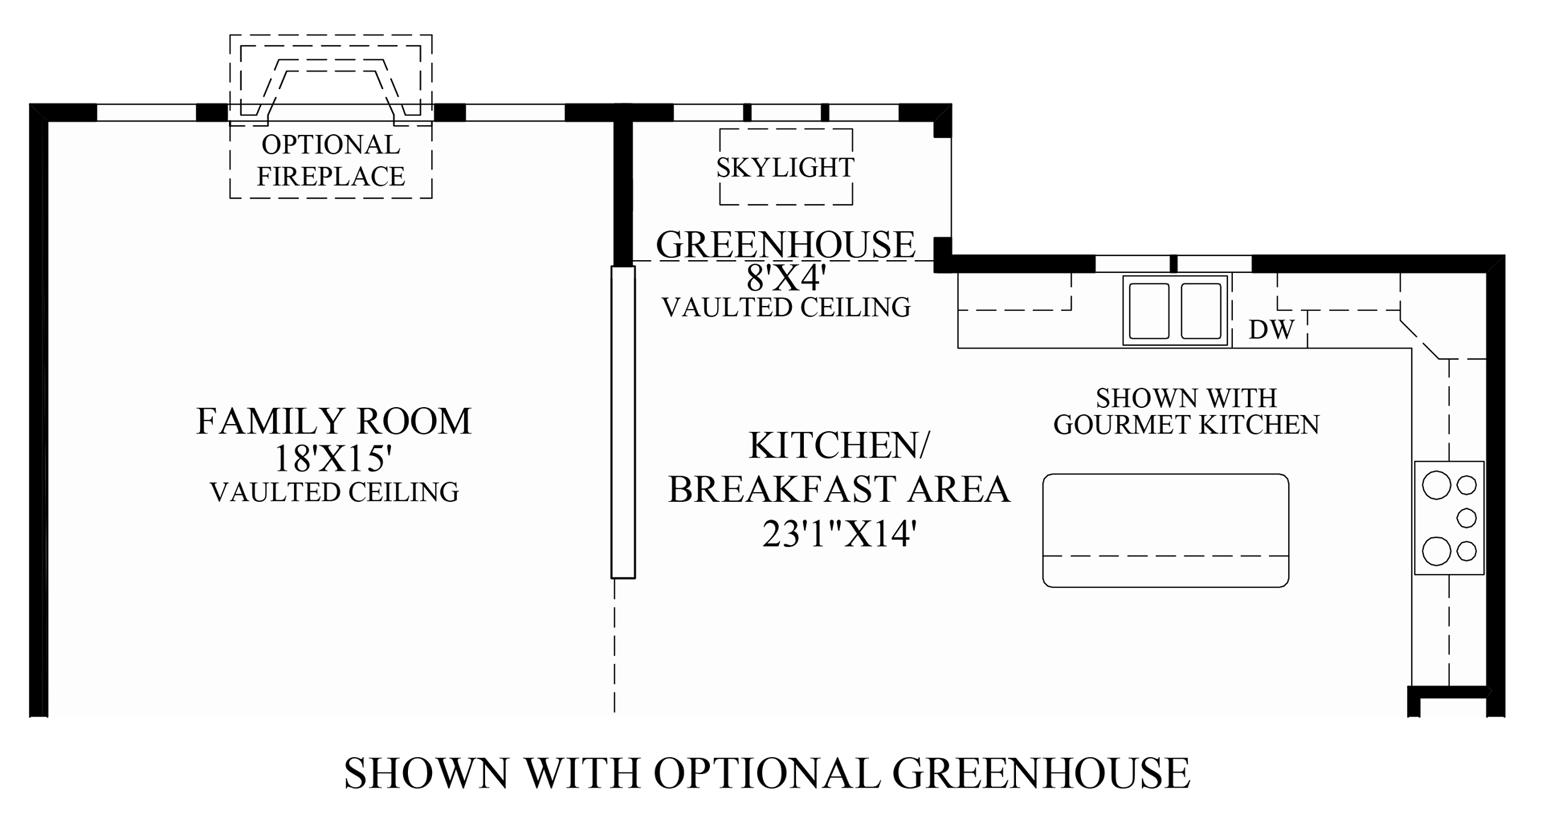 marlboro ridge the glen the woodstock home design